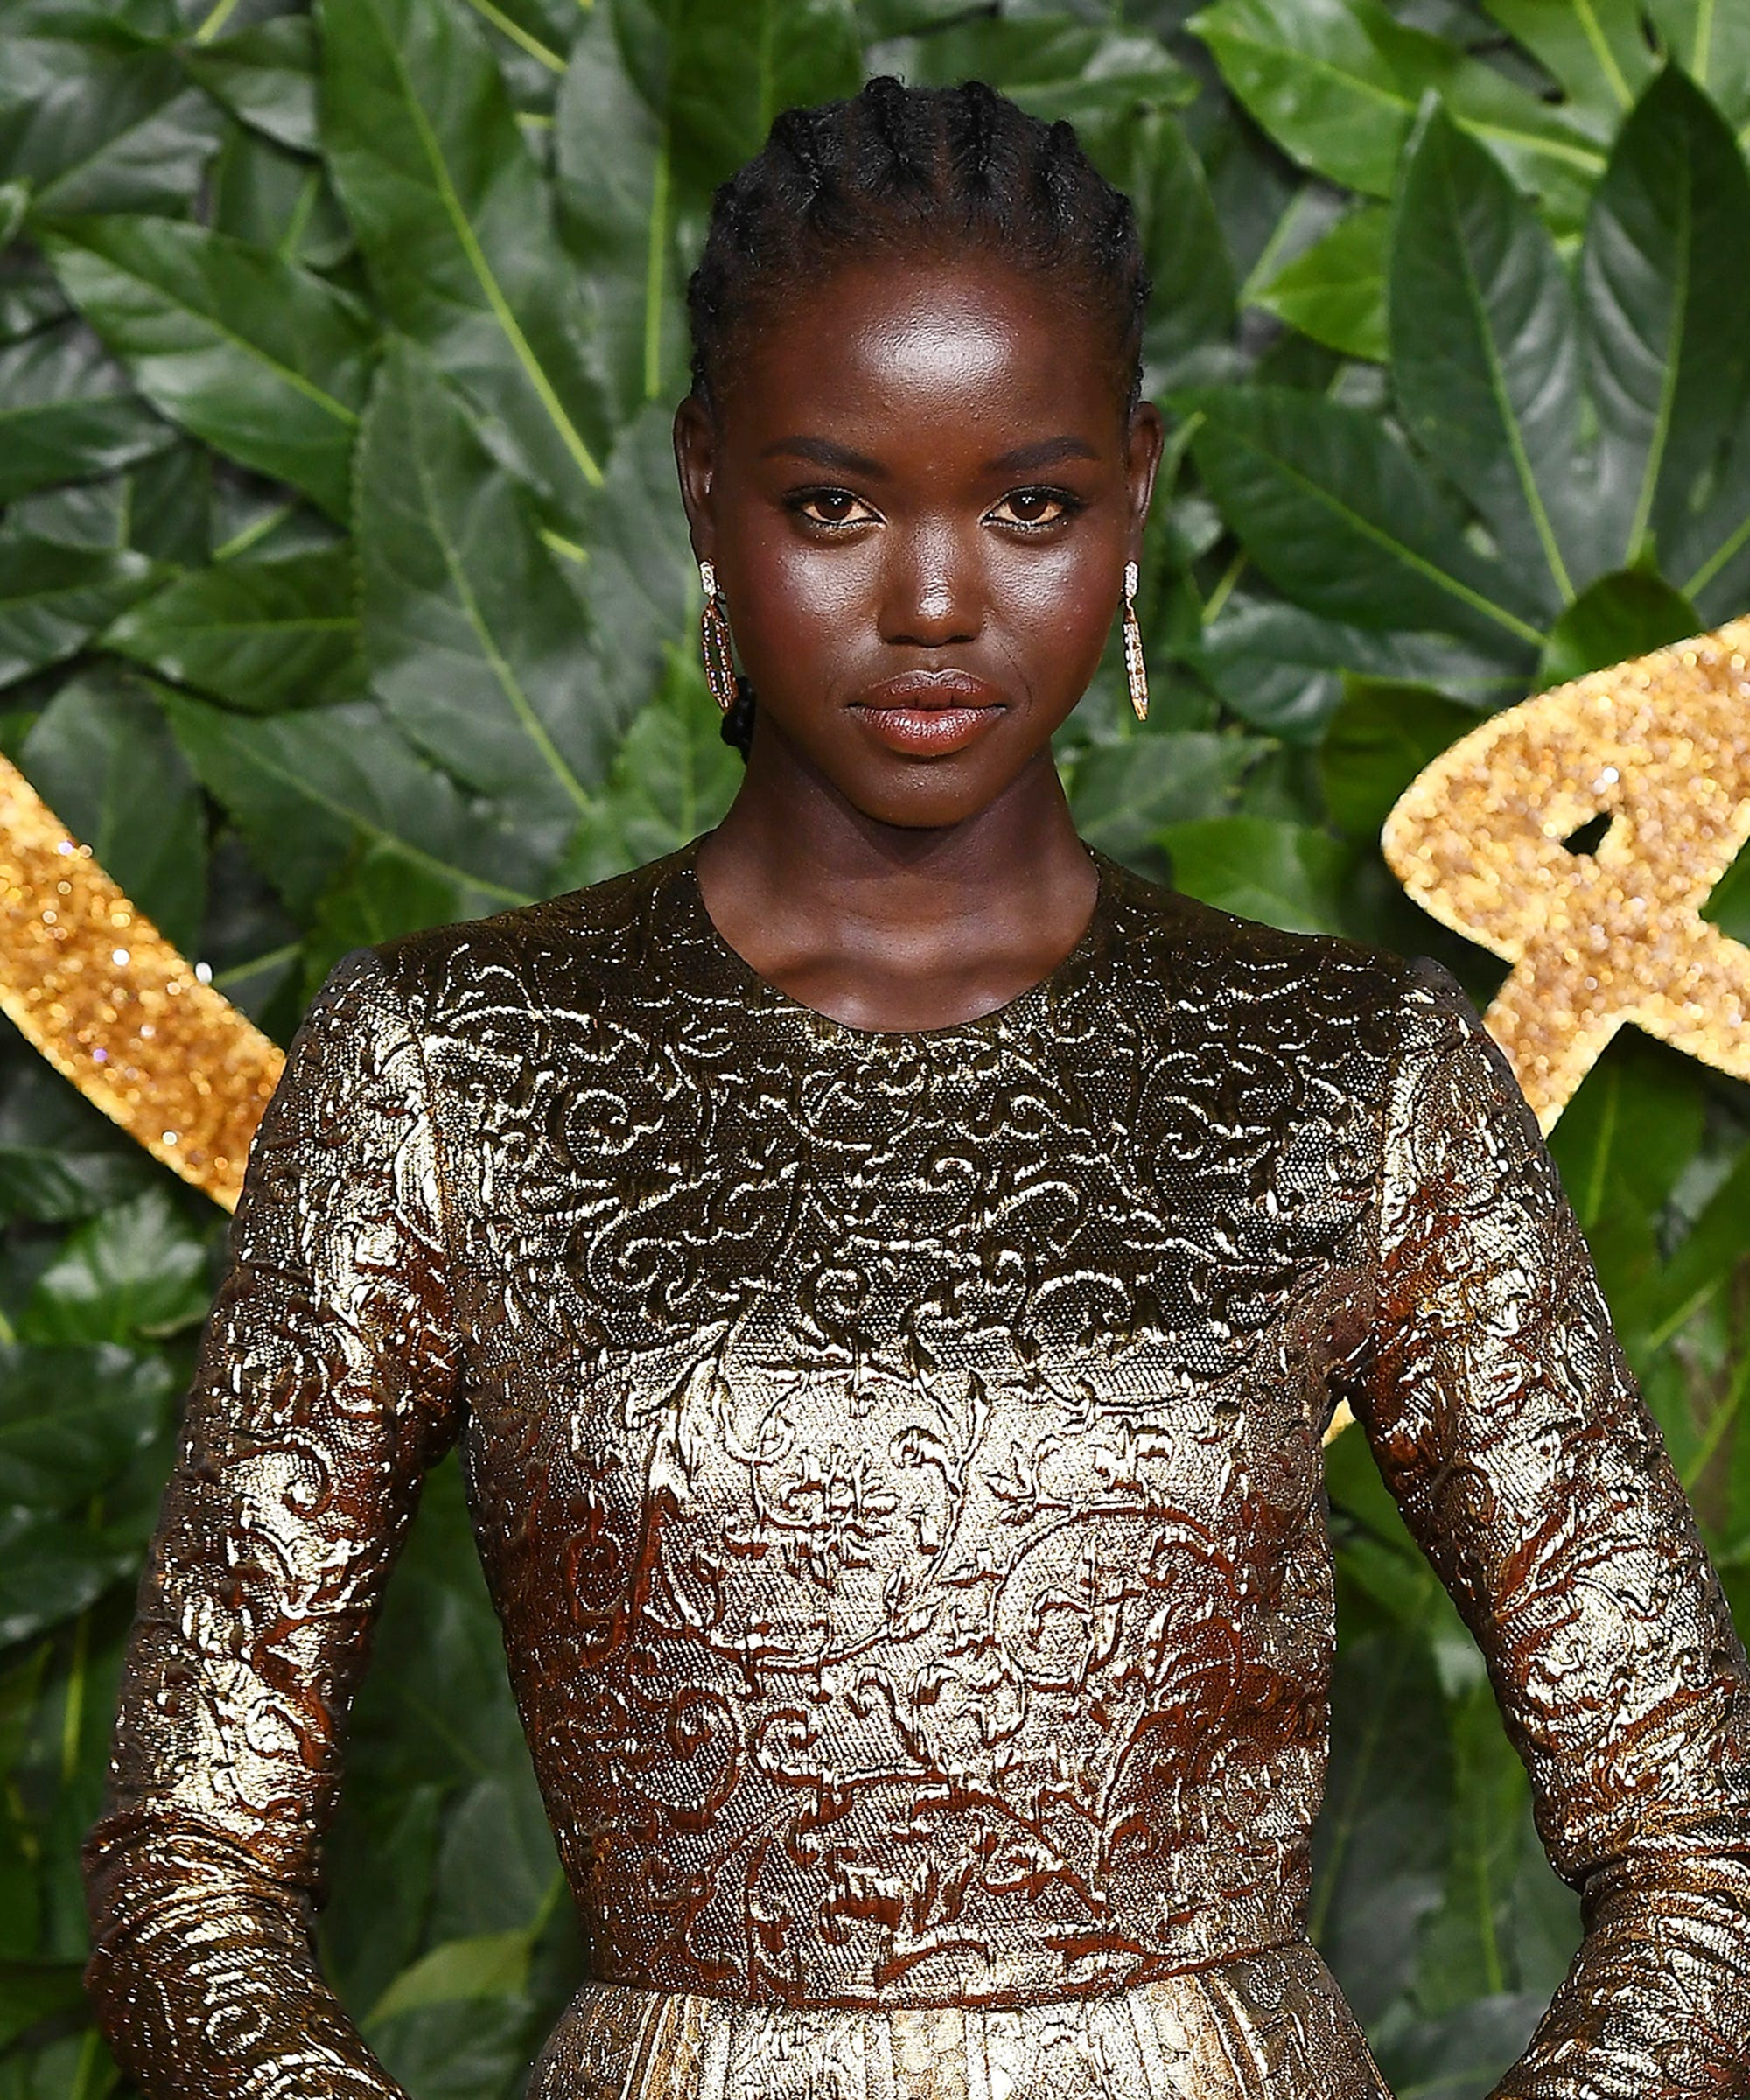 Adut Akech Wins Model Of The Year